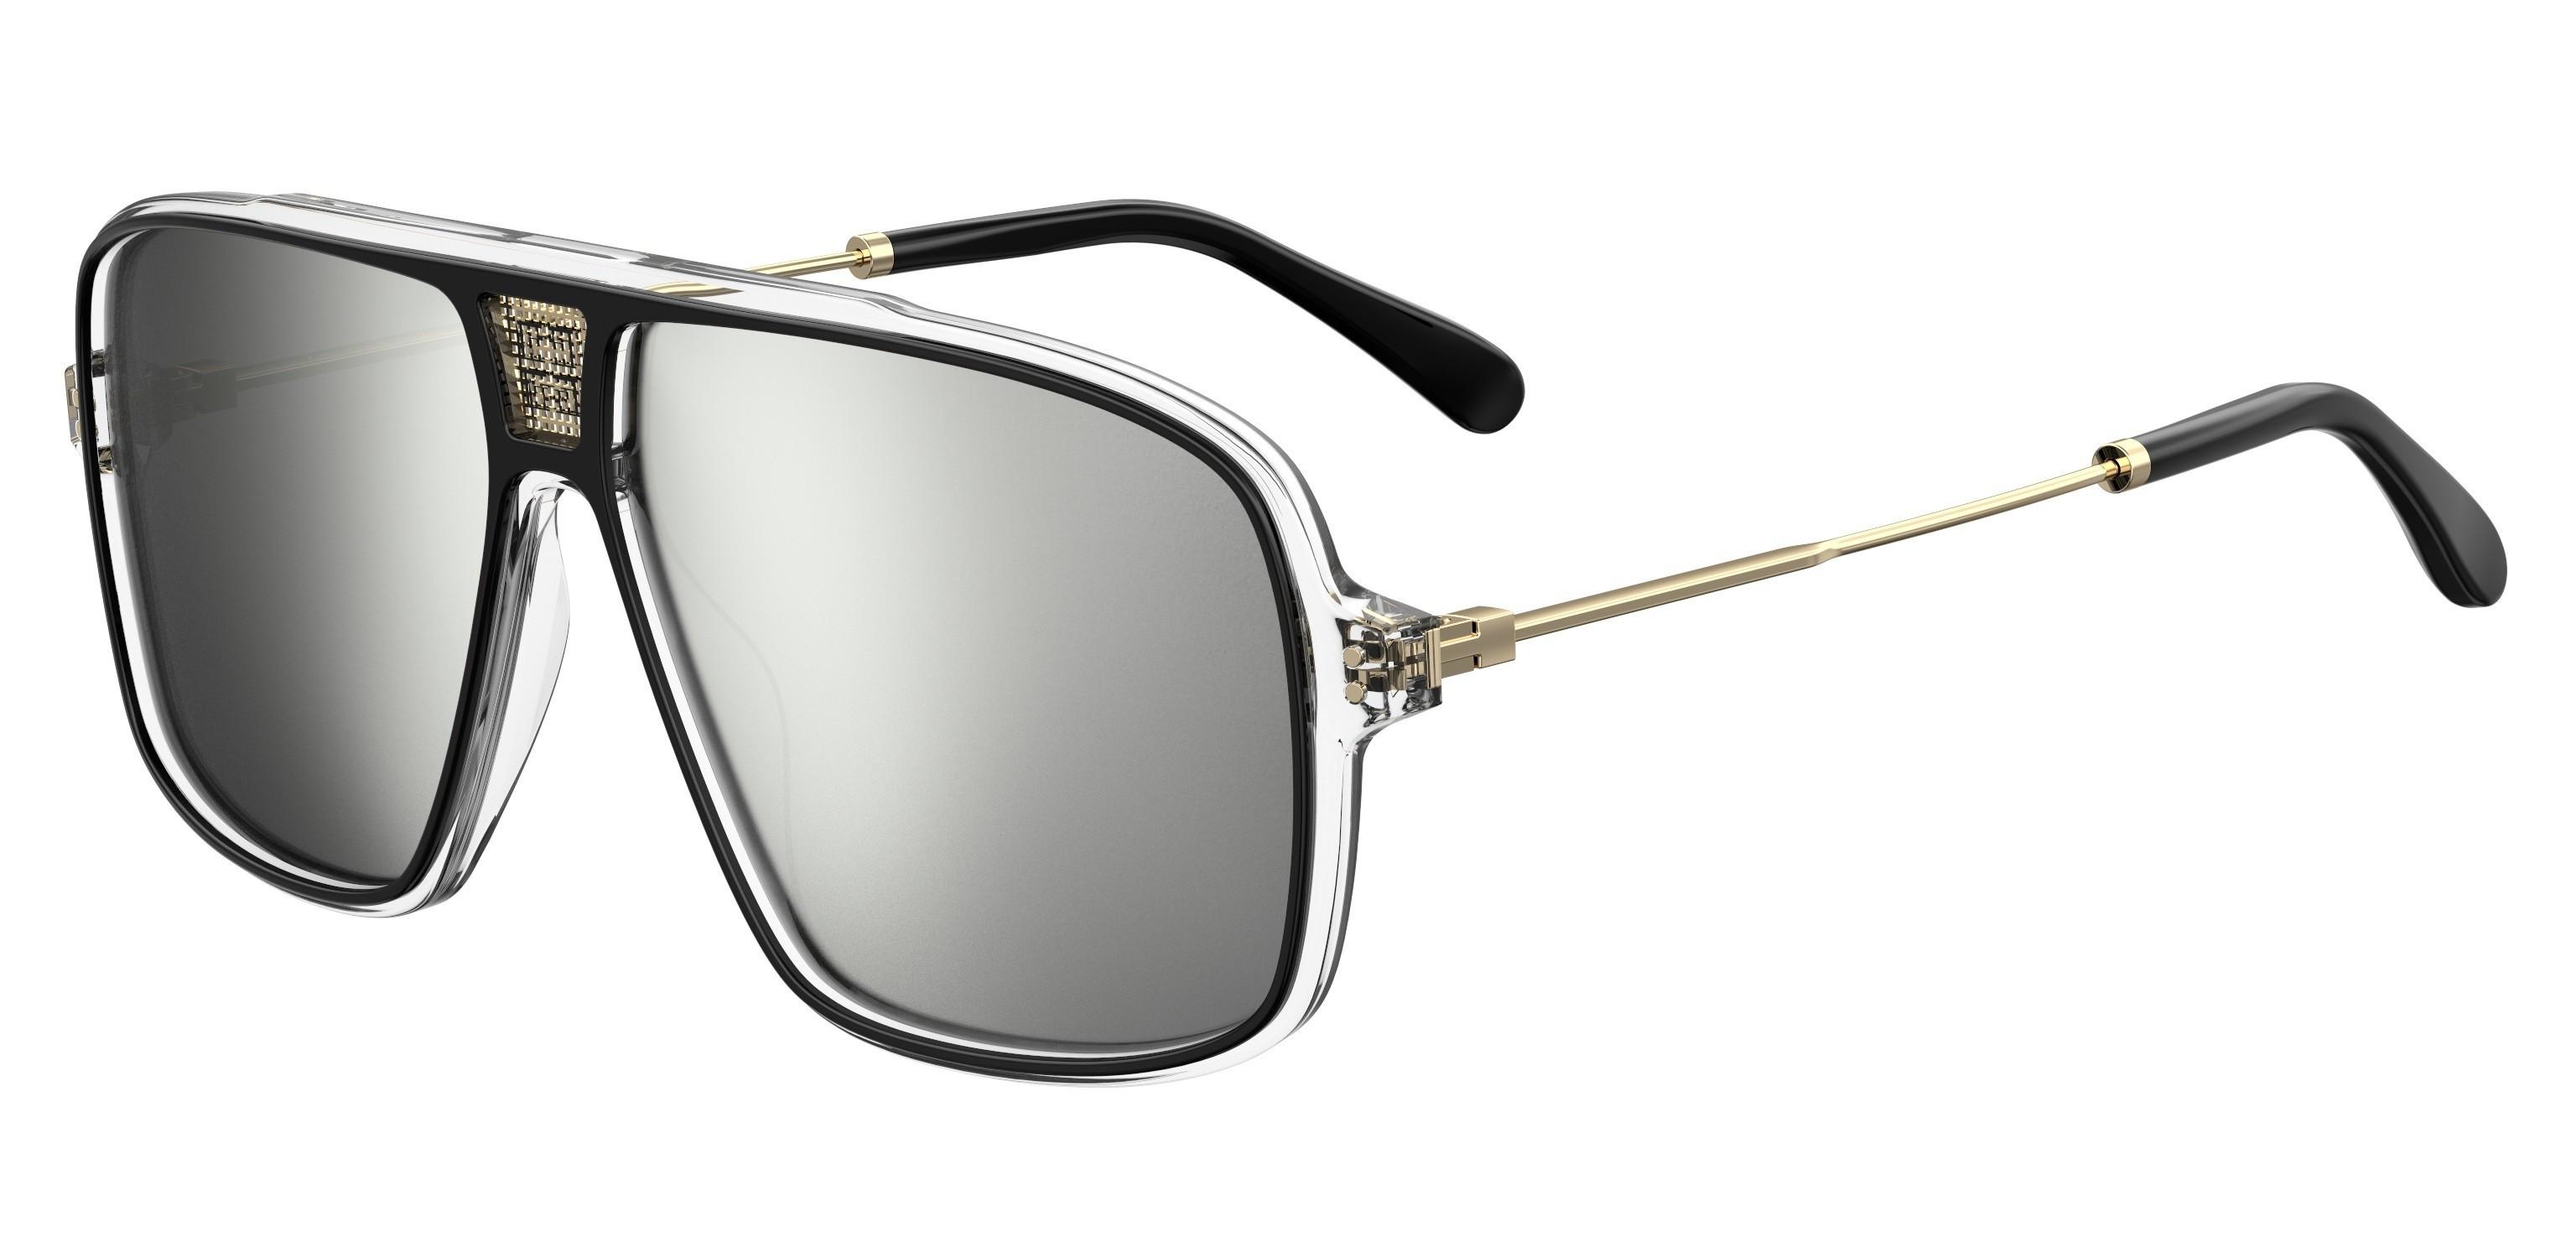 Givenchy GV 7061/S Sunglasses - Givenchy Authorized